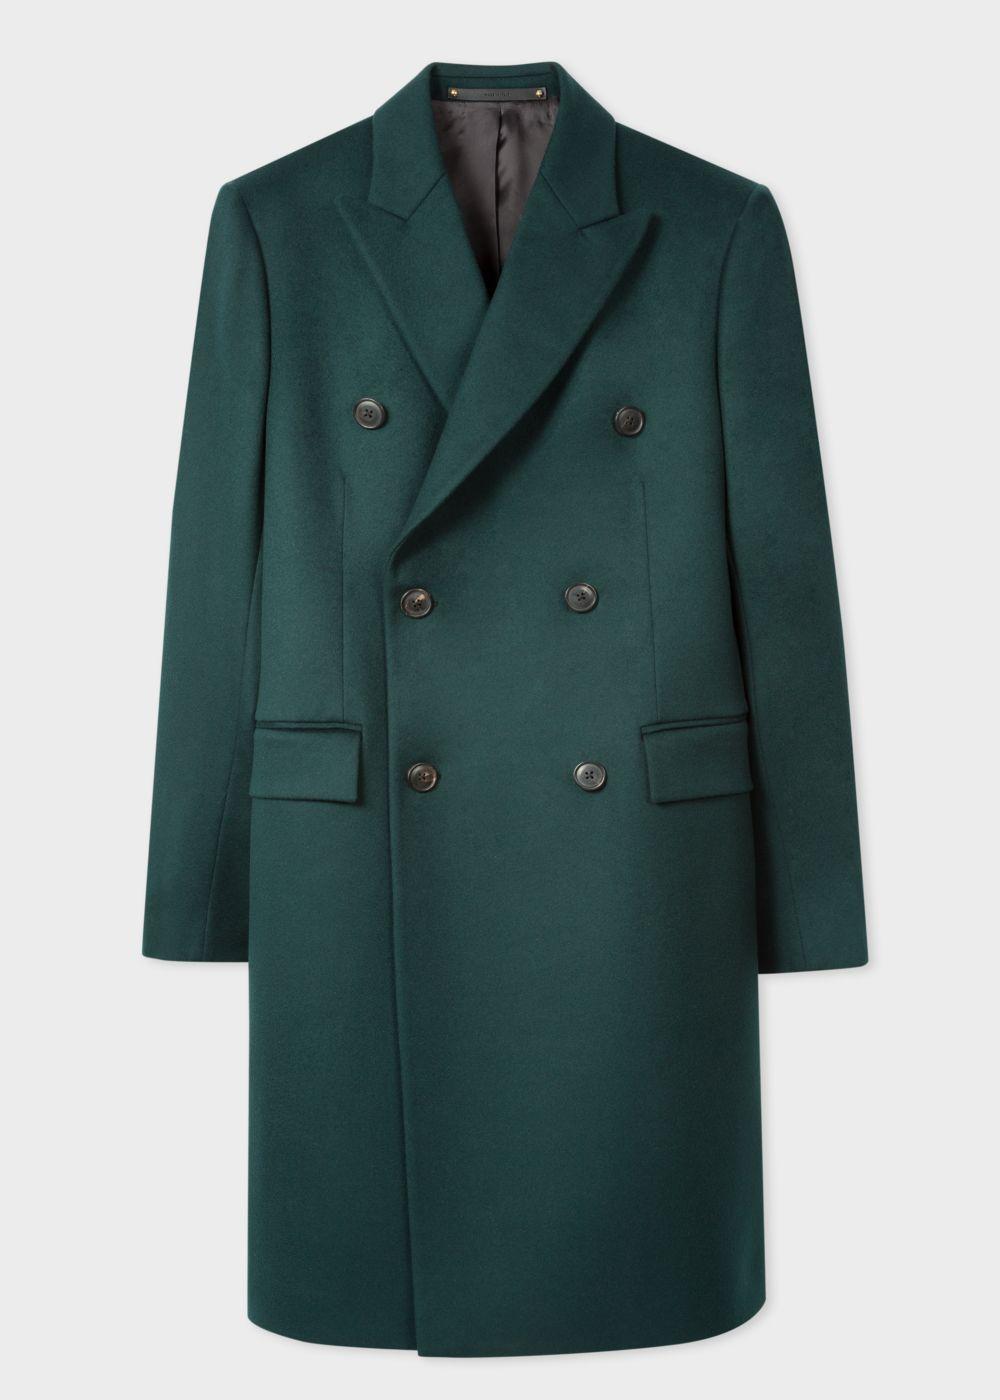 Men S Dark Green Double Breasted Wool And Cashmere Overcoat Paul Smith Cashmere Overcoat Designer Jackets For Men Overcoats [ 1400 x 1000 Pixel ]